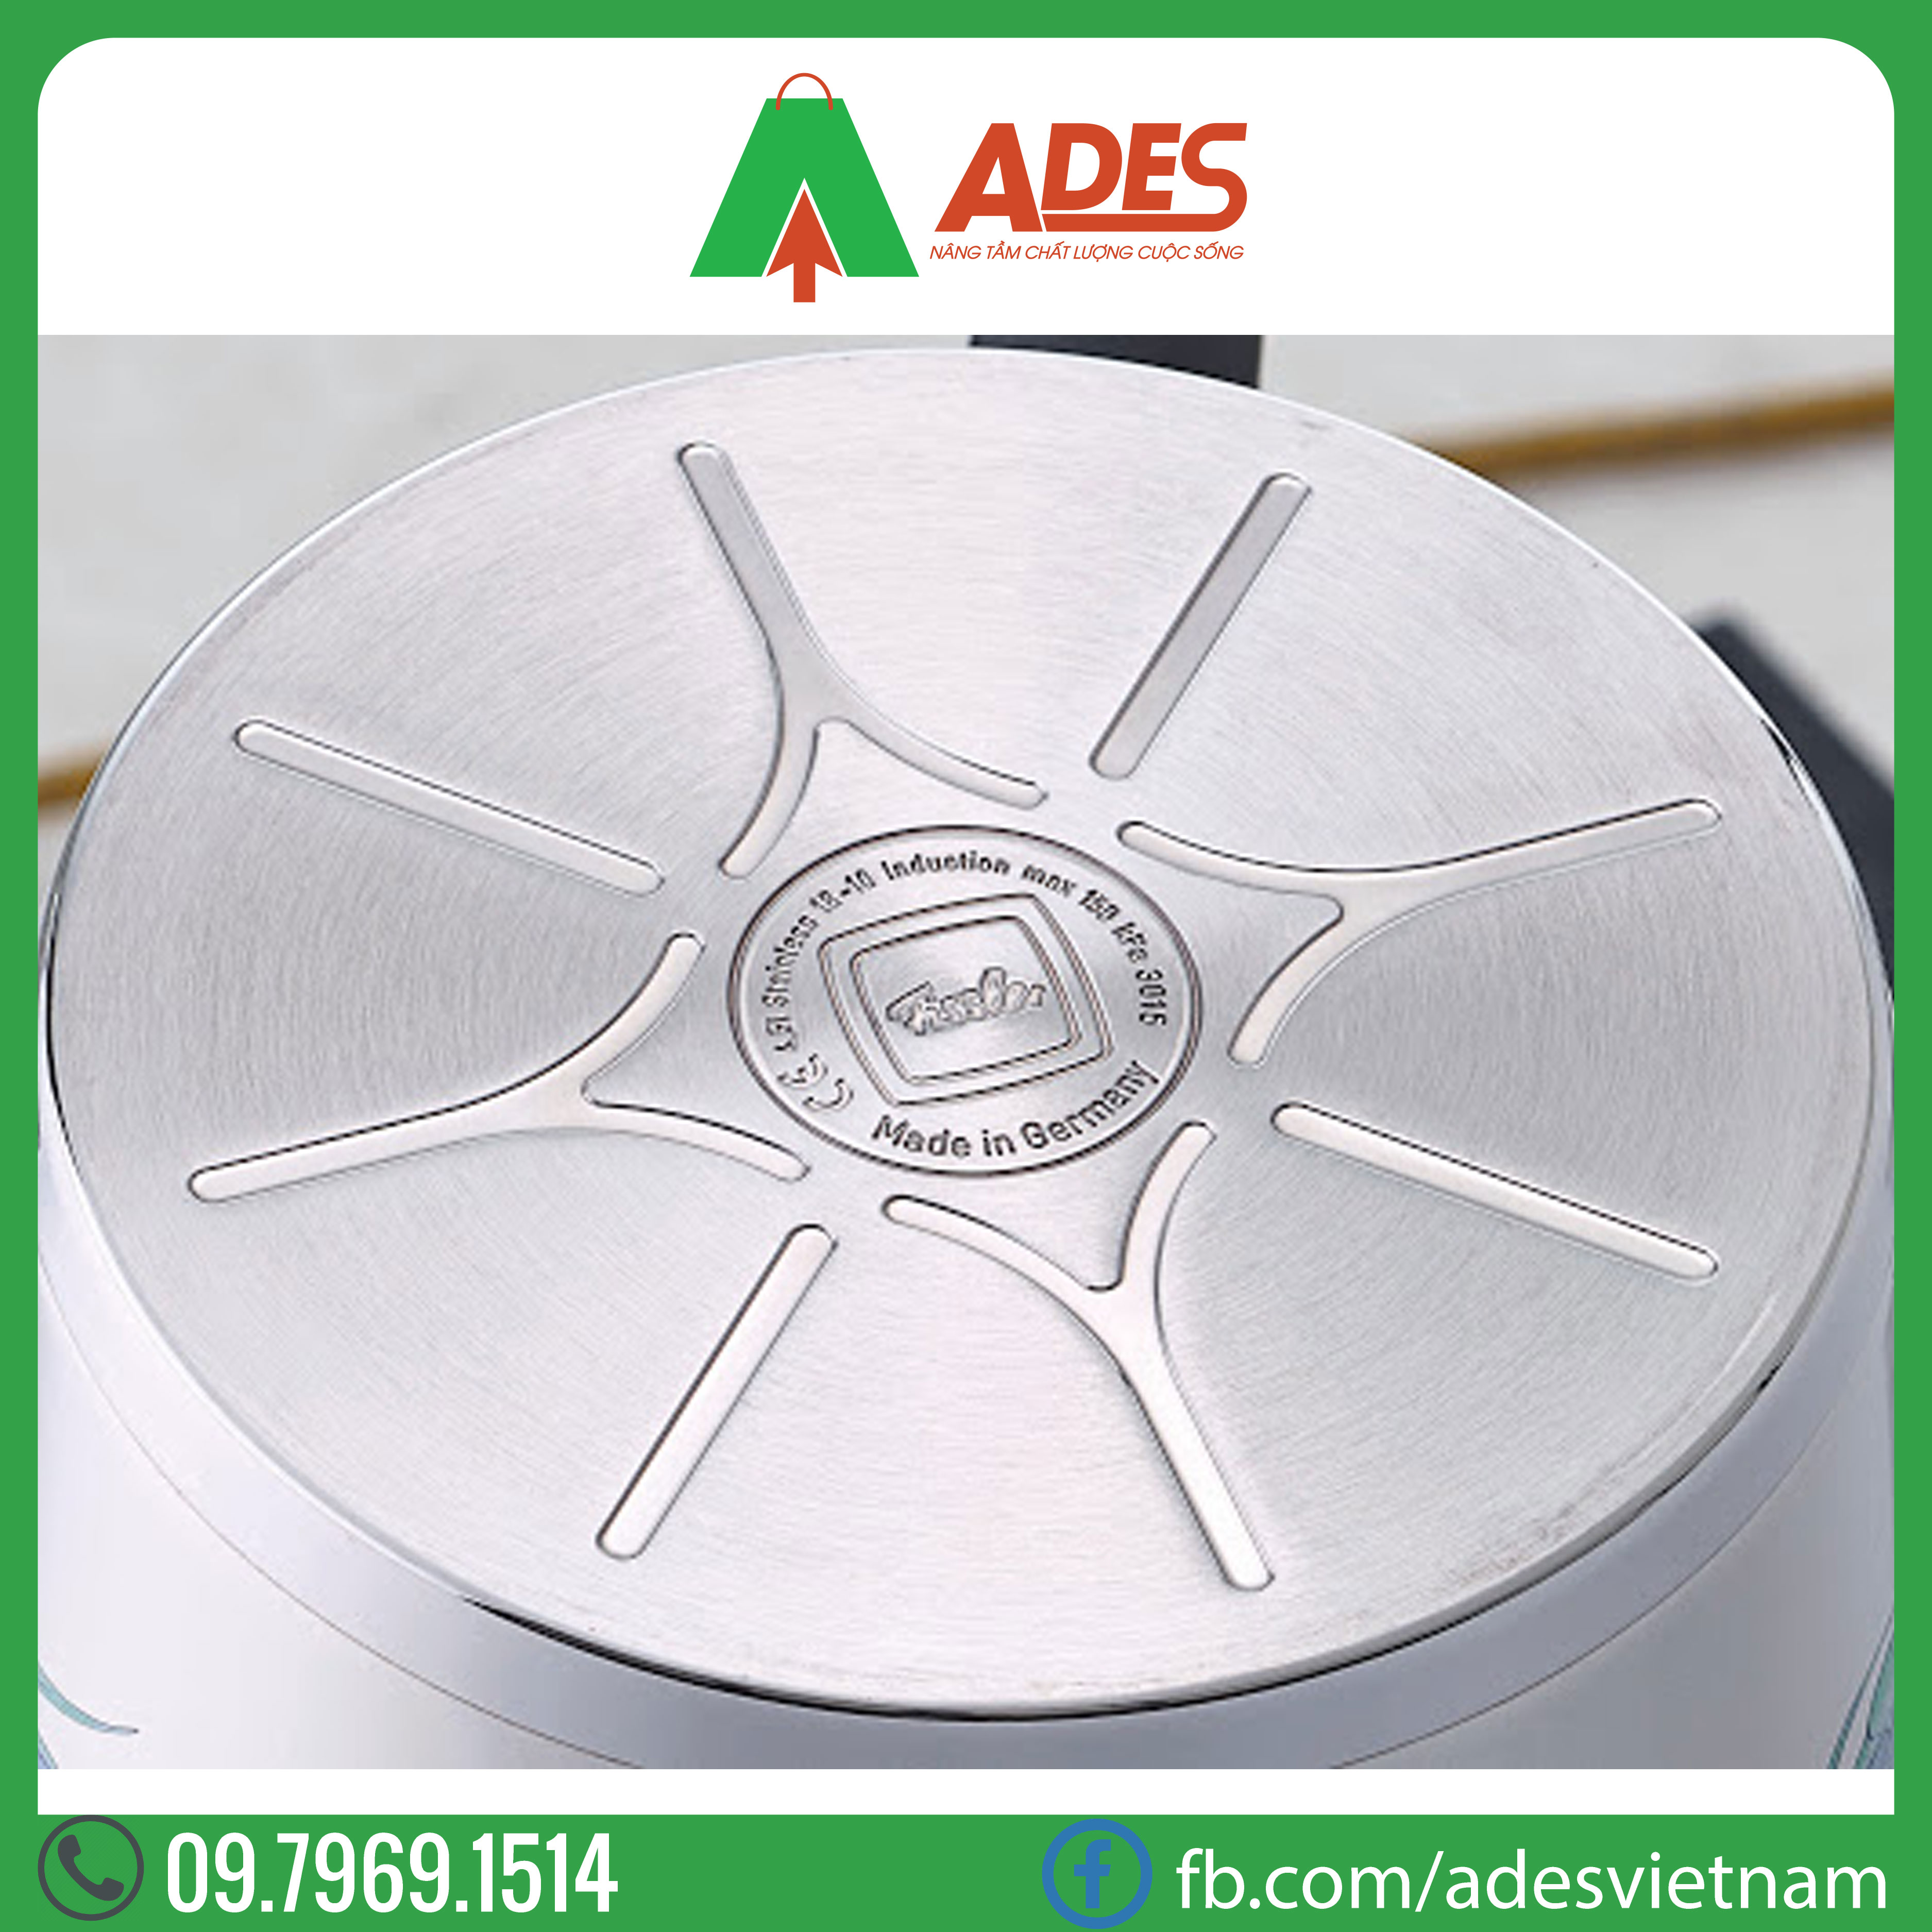 Quanh inox cao cap Fissler Pro 16cm | Dien may Ades